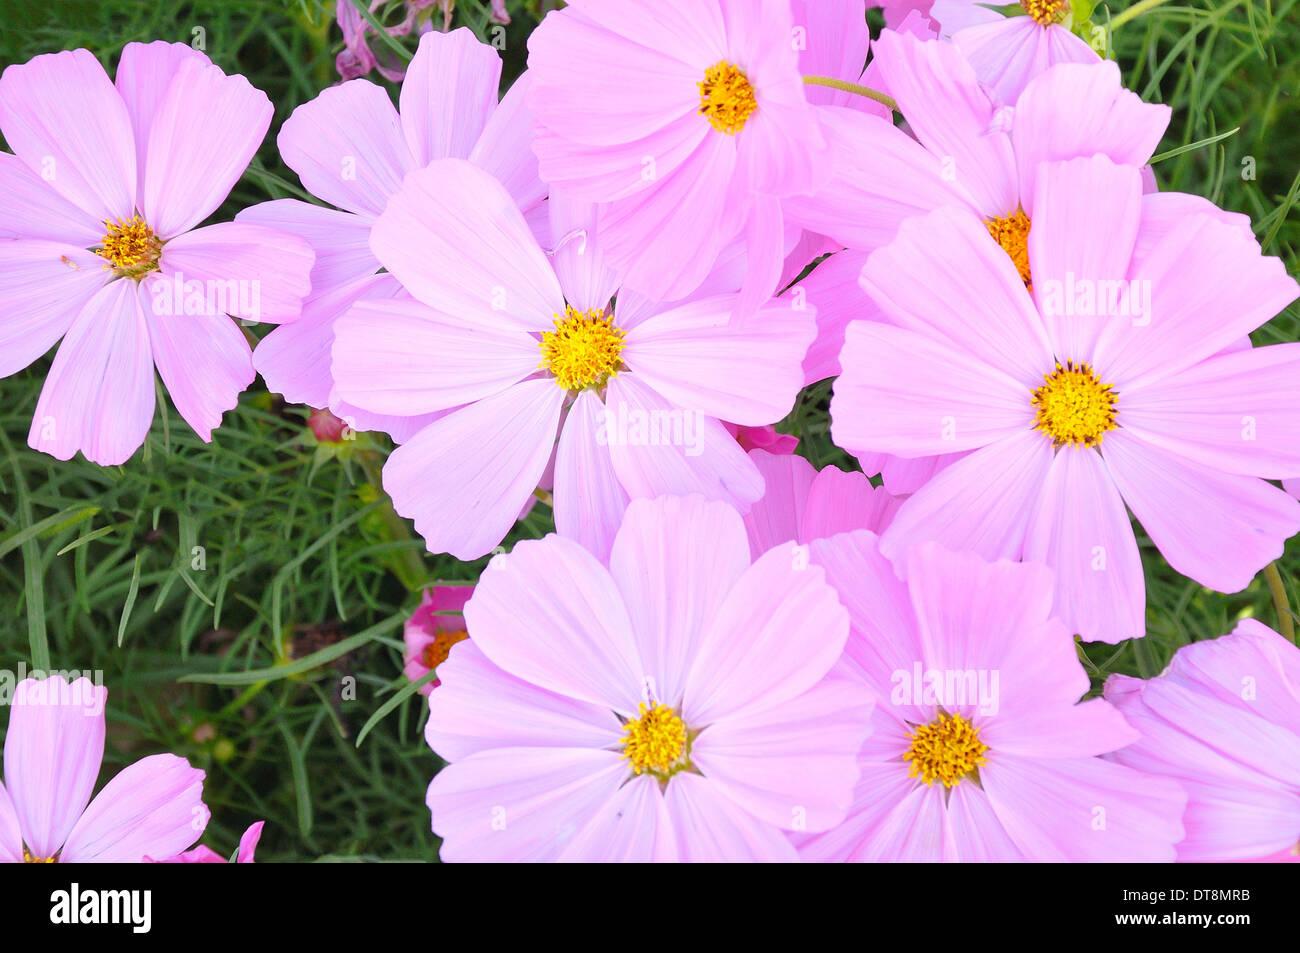 Bouquet daisy like stock photos bouquet daisy like stock images pink of many small flower look like stars stock image izmirmasajfo